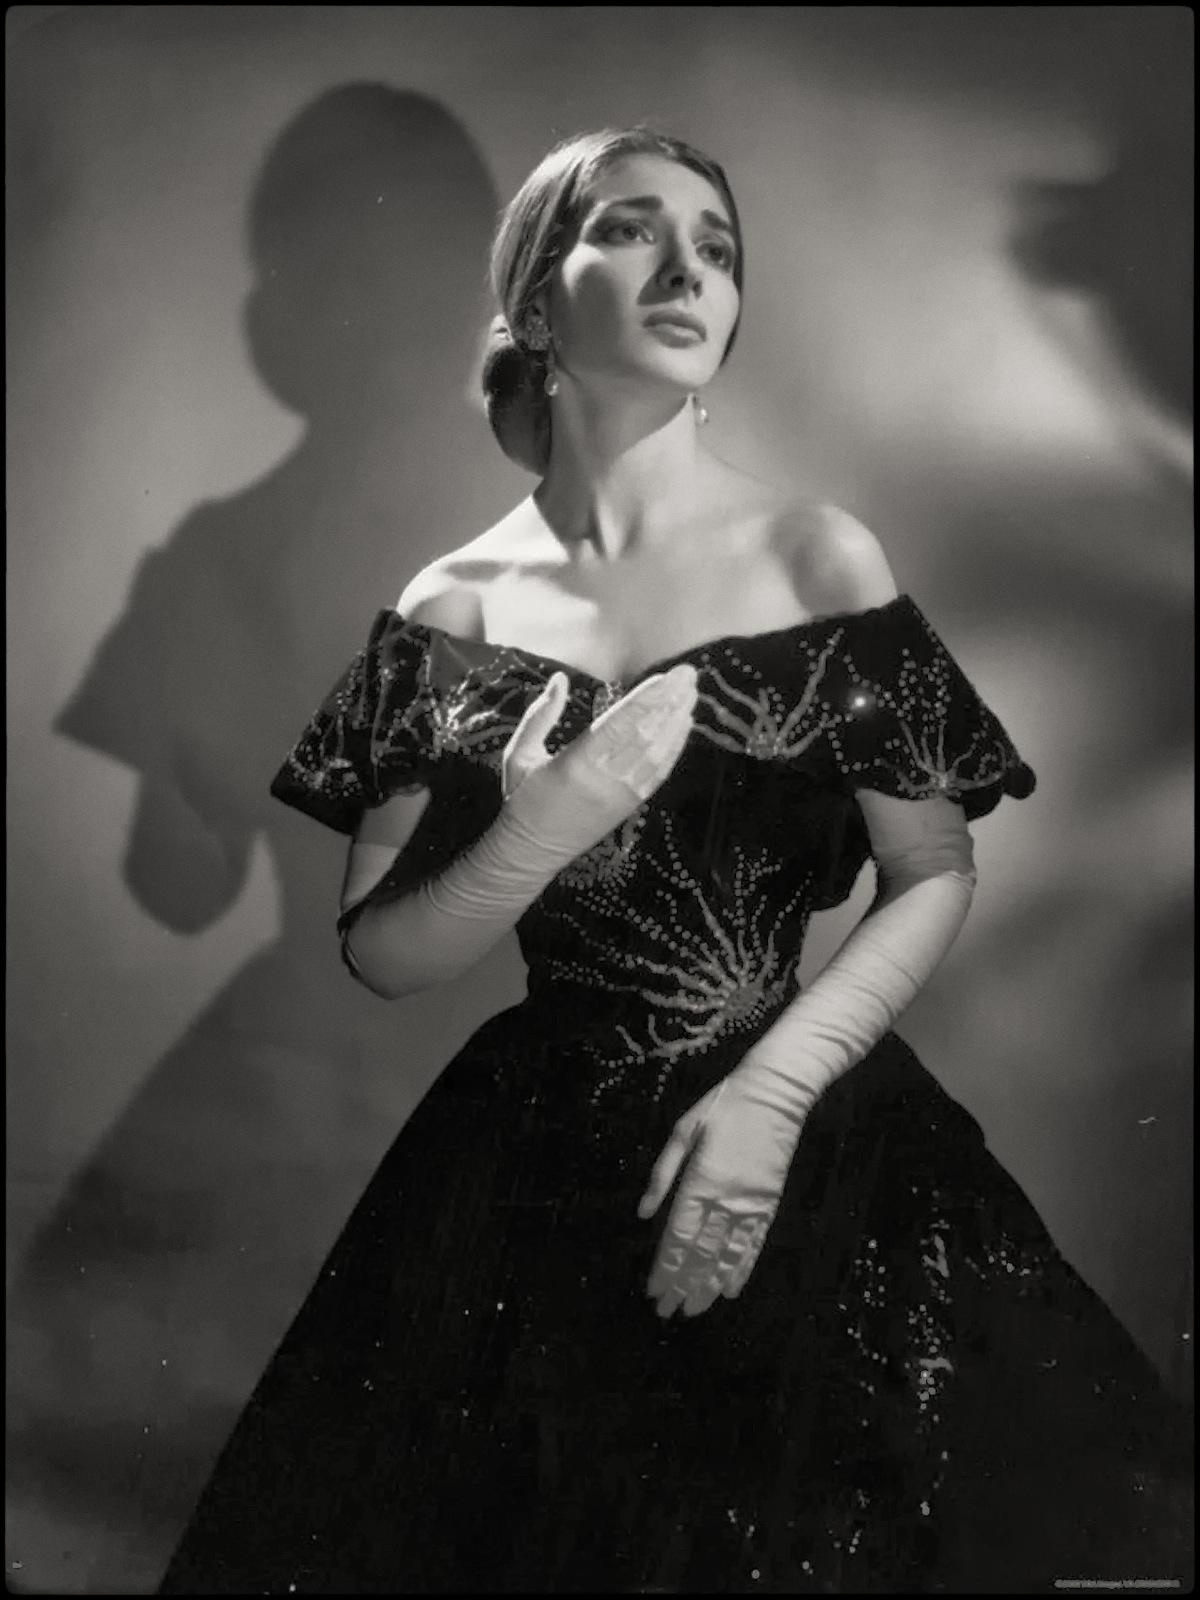 Biografía Hoy María Callas Gran Soprano Cantante De